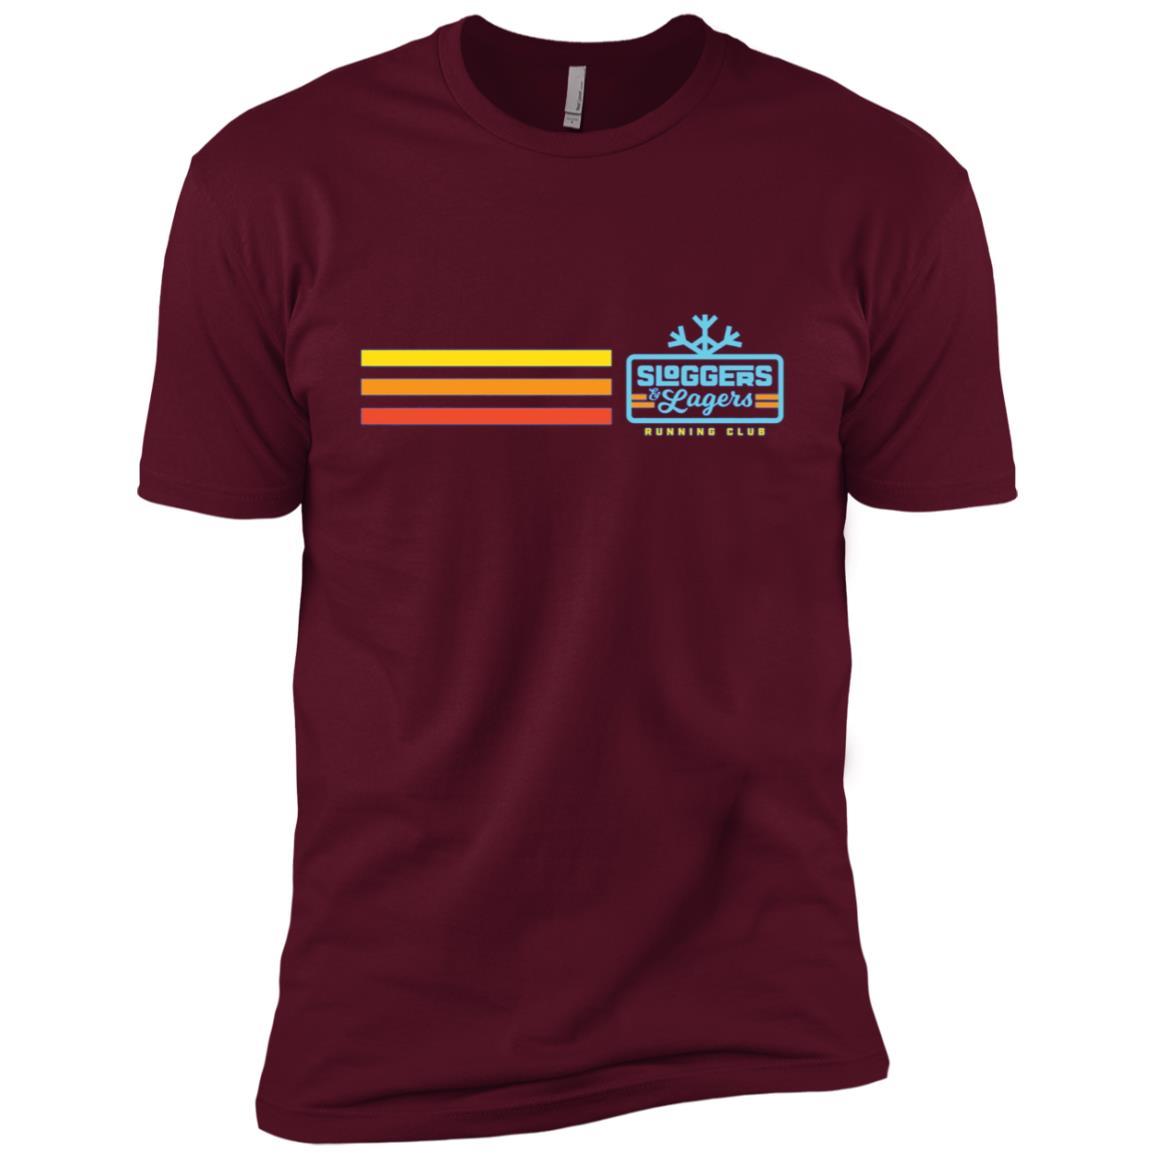 Sloggers & Lagers Running Club Men Short Sleeve T-Shirt